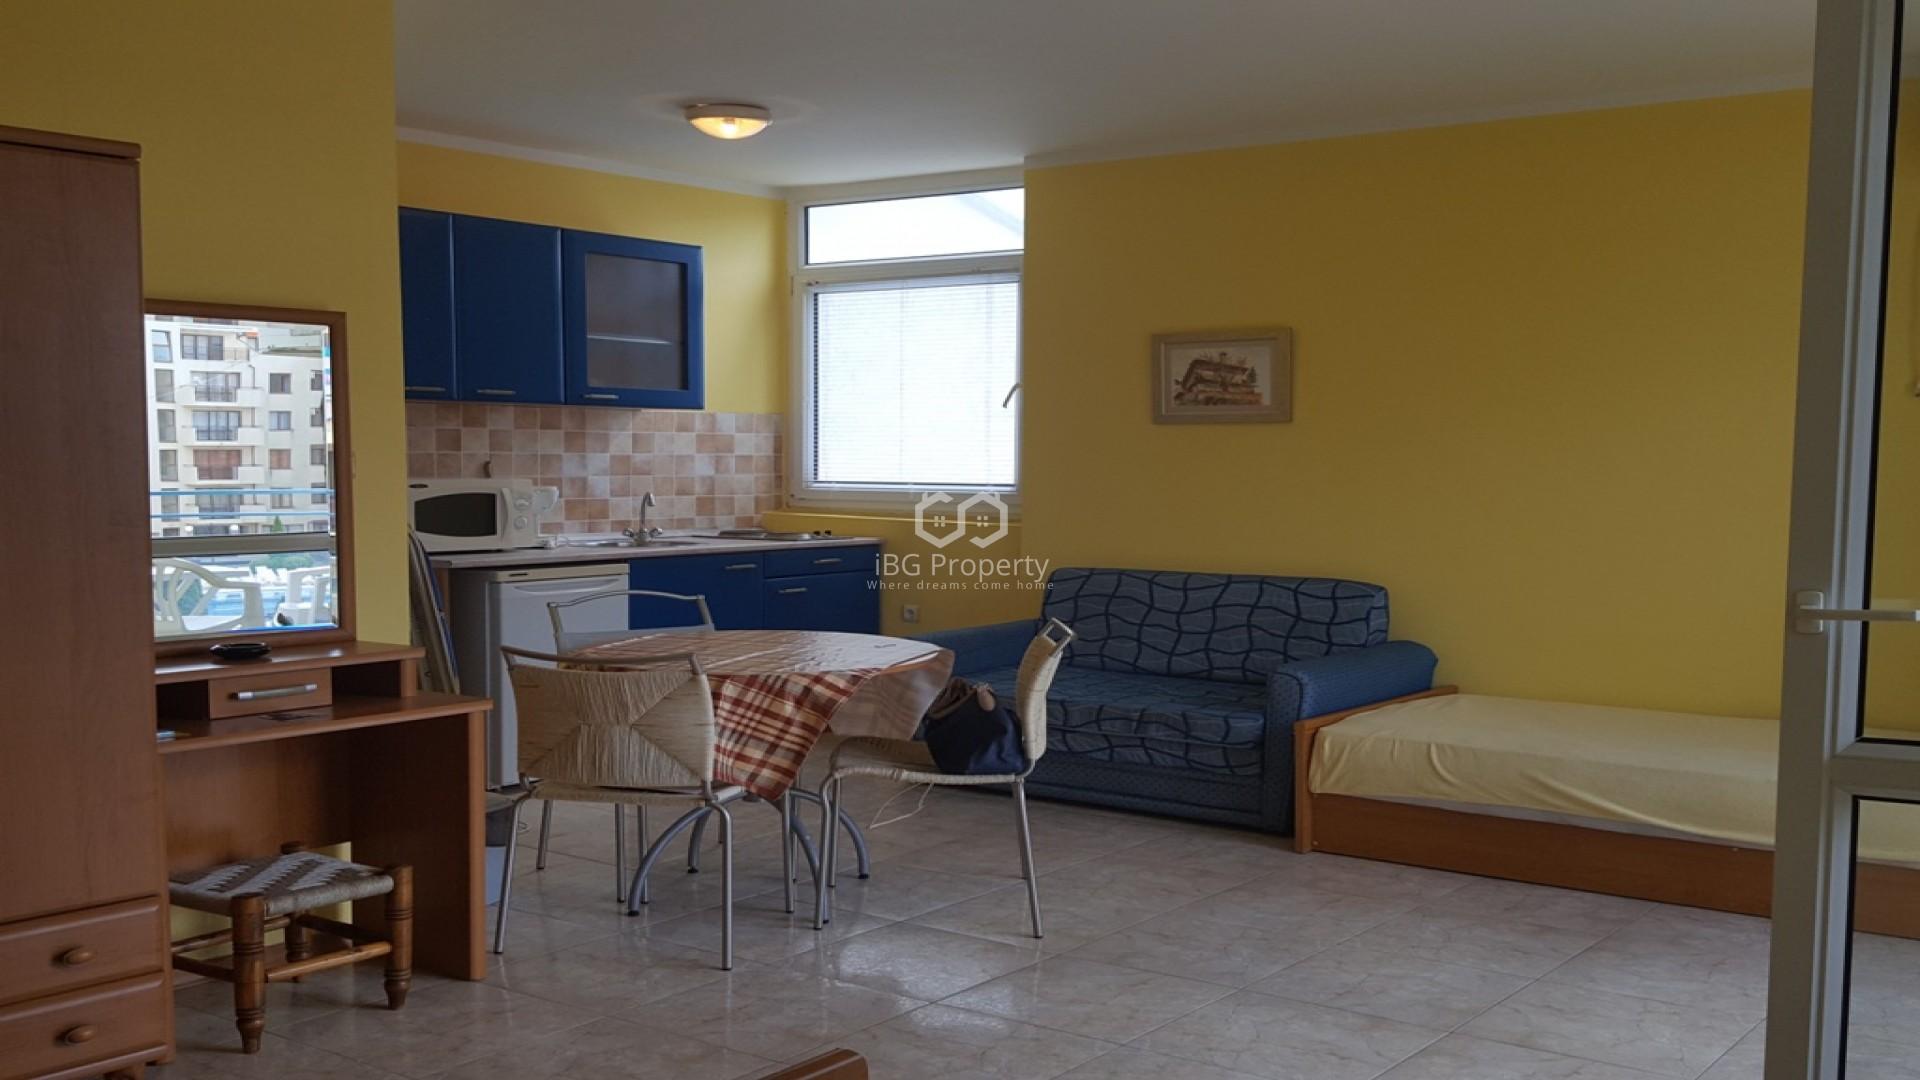 Eдностаен апартамент Слънчев Бряг 46 m2